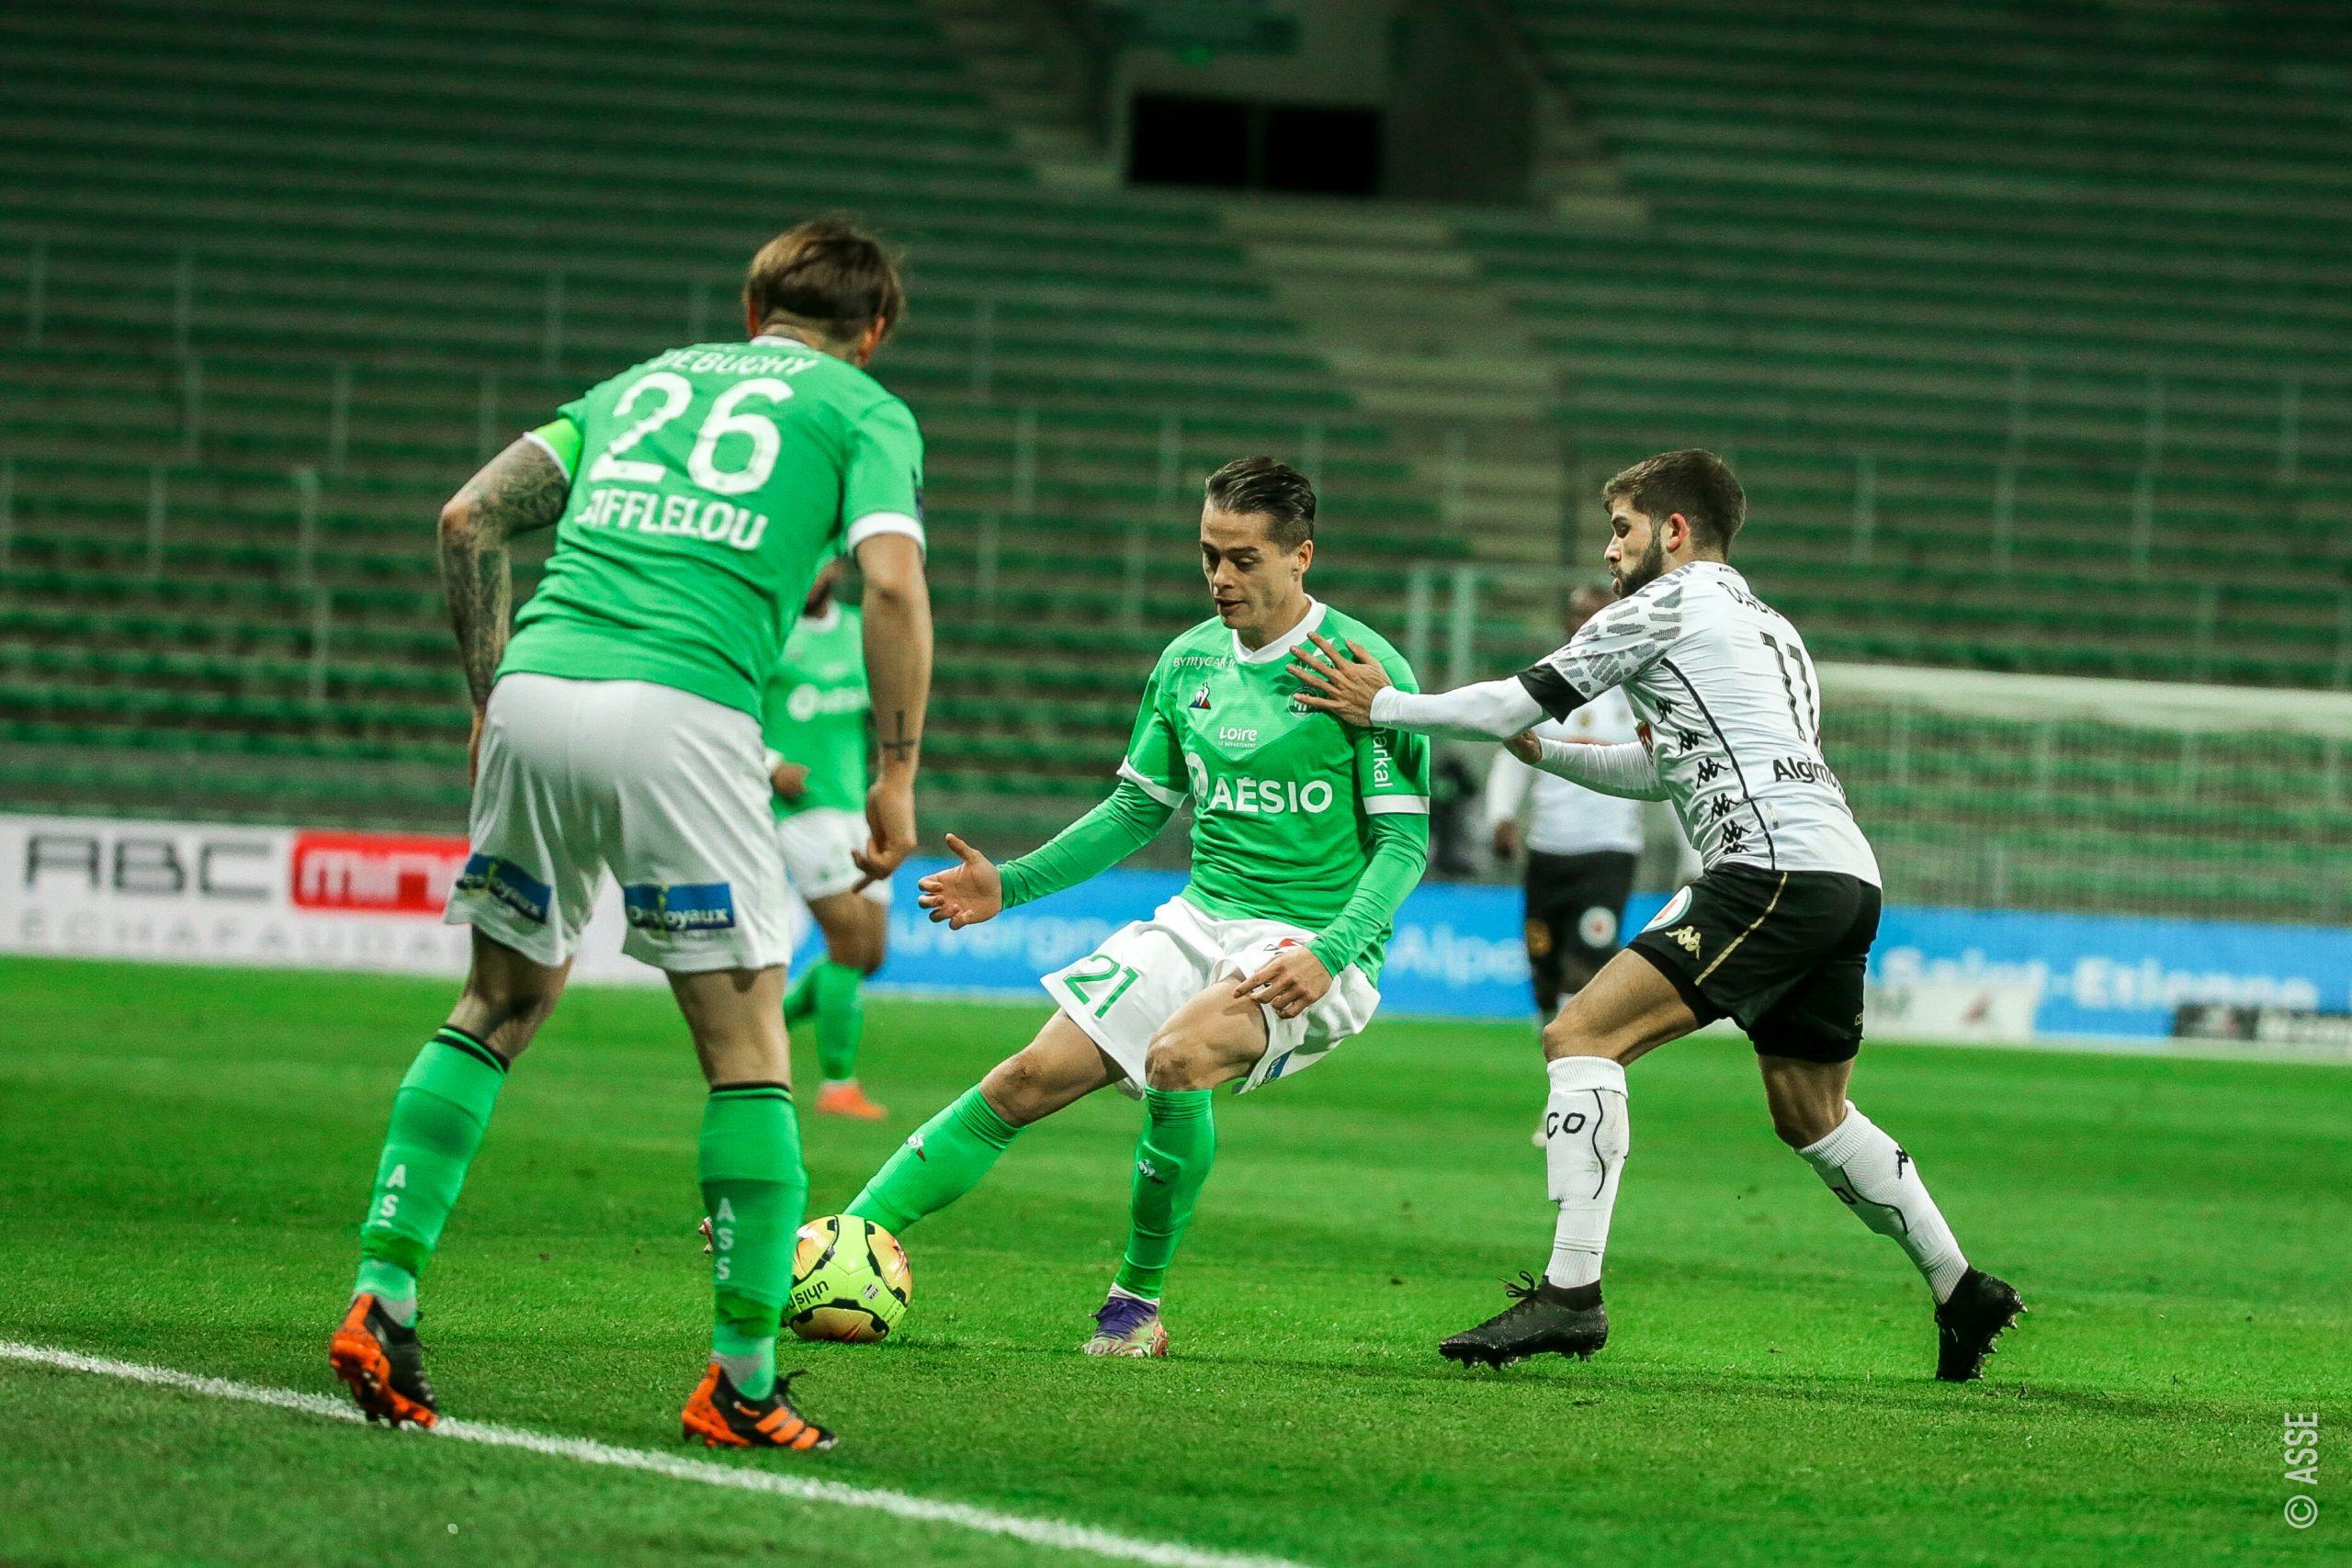 Saint-Étienne e Angers empatam pela Ligue 1 (Foto: Divulgação / Twitter / AS Saint-Étienne)